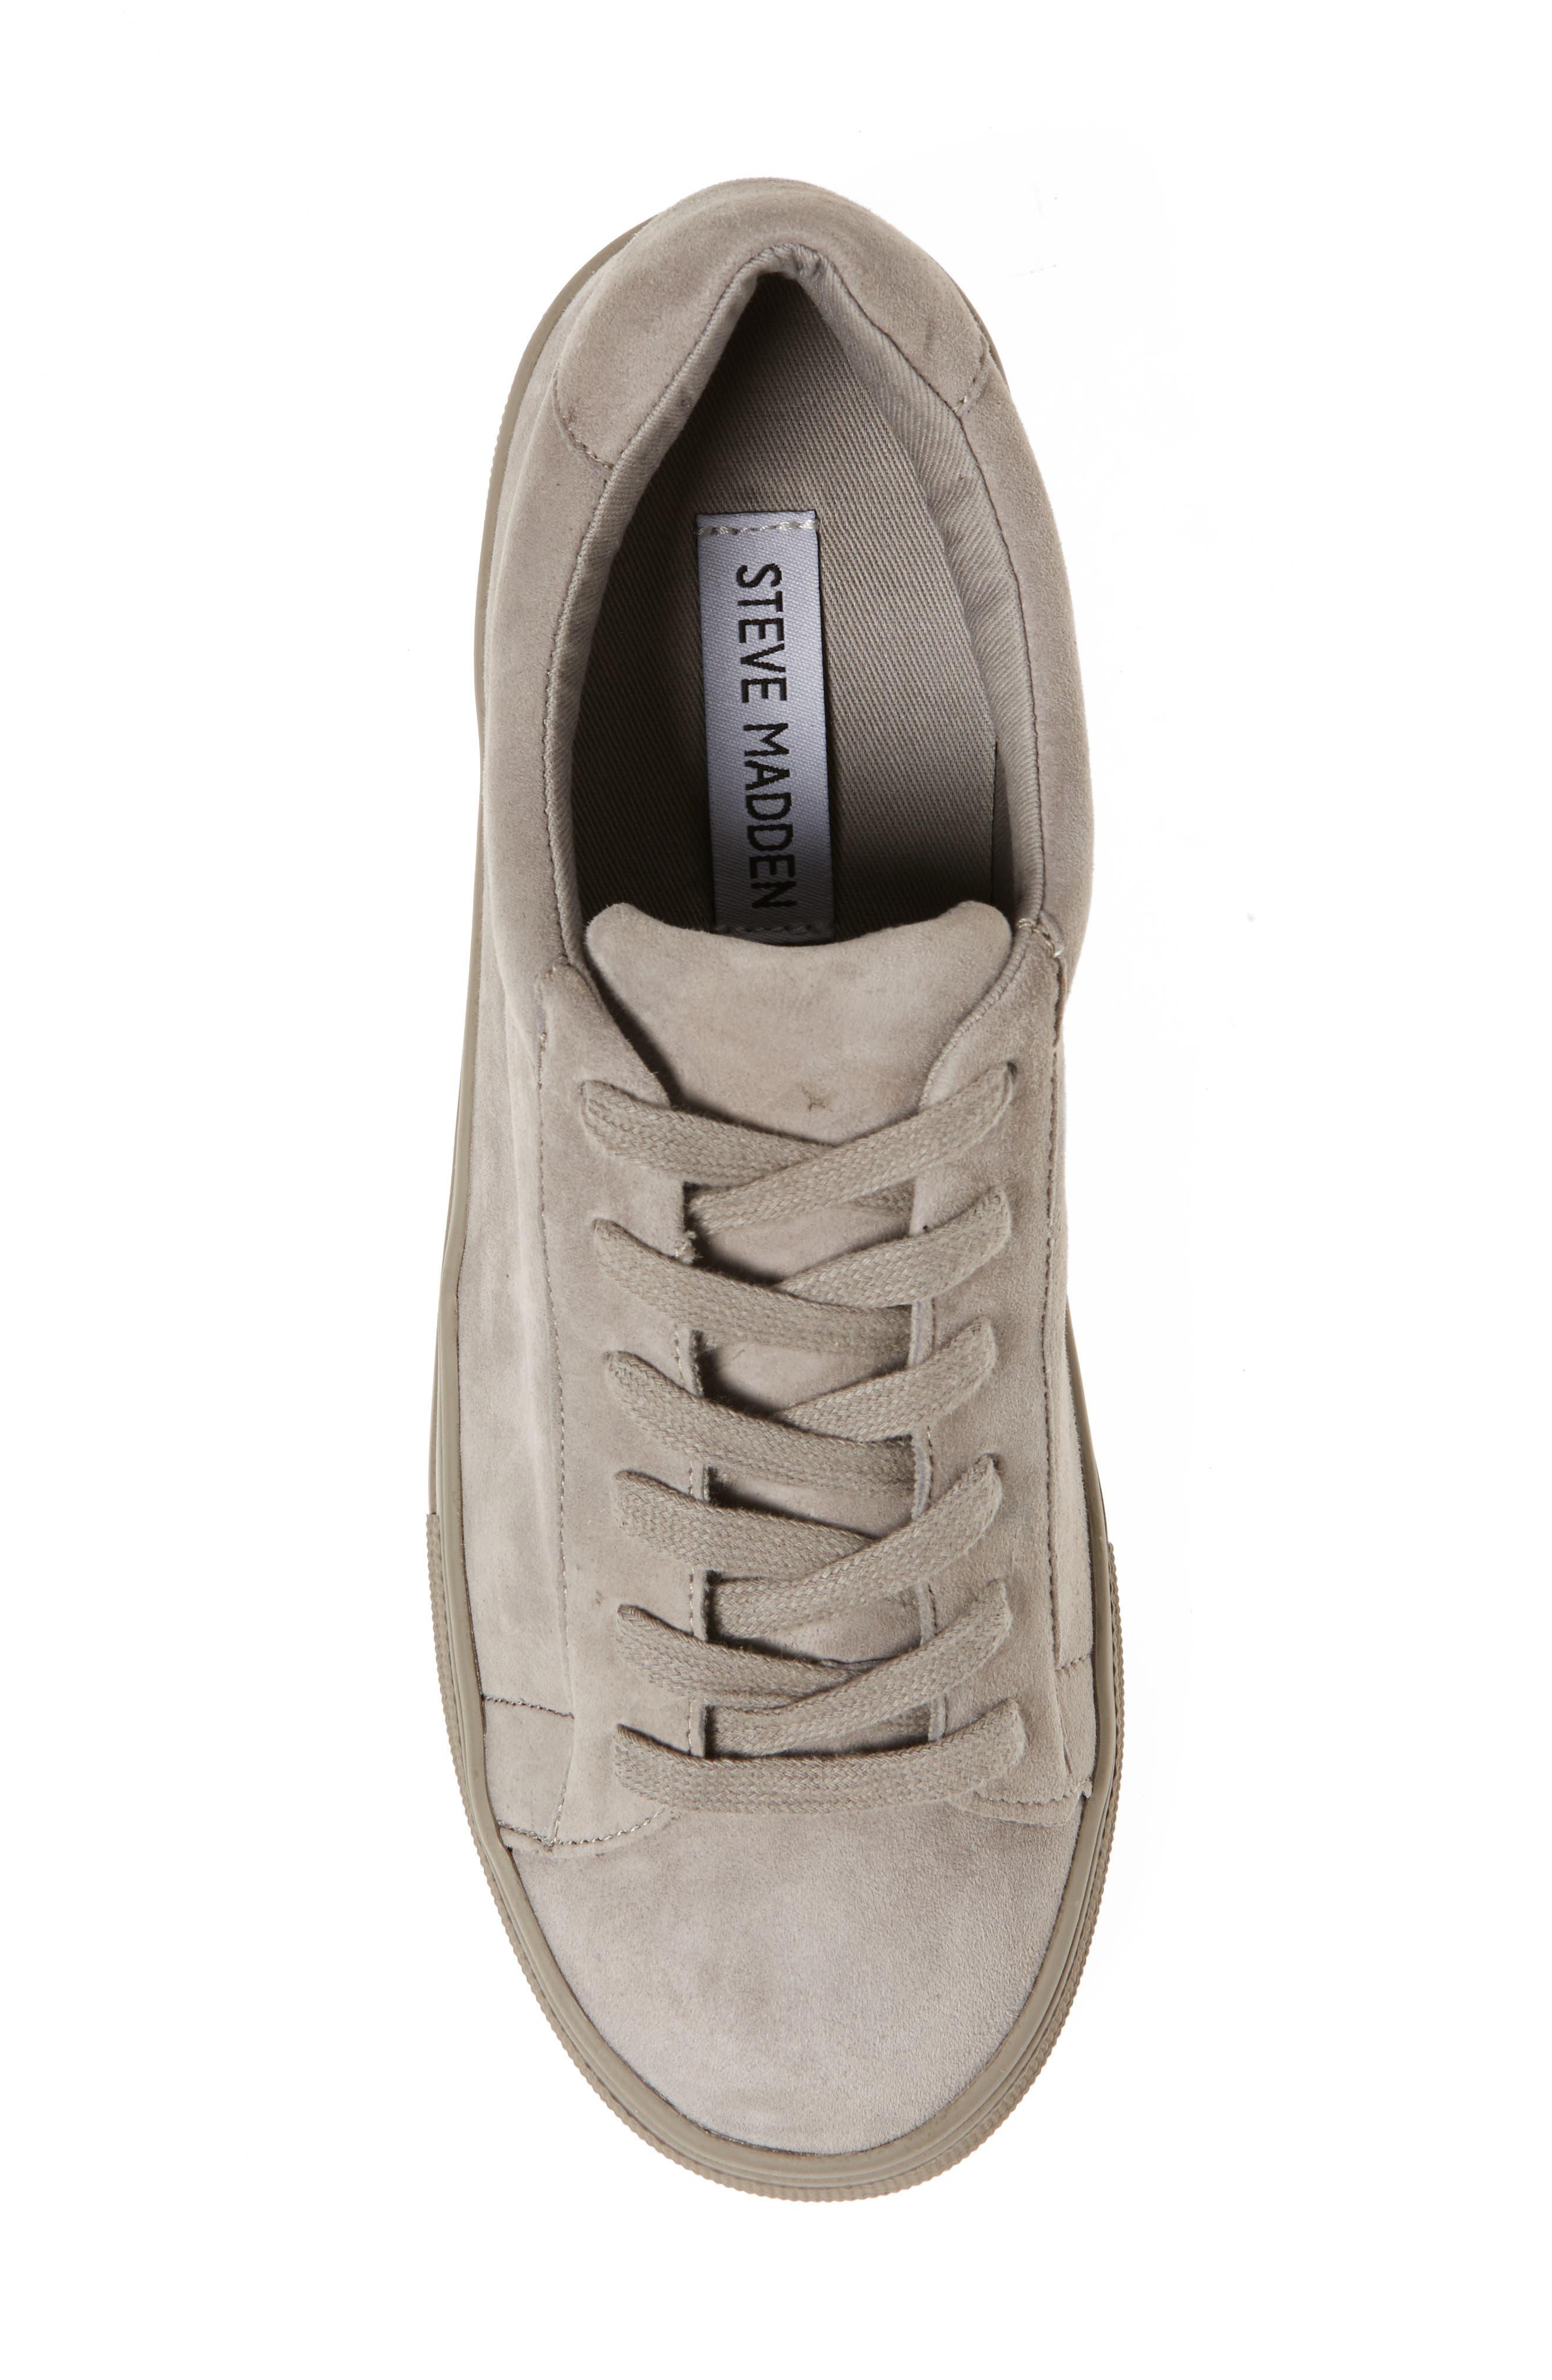 Gisela Low Top Sneaker,                             Alternate thumbnail 5, color,                             020